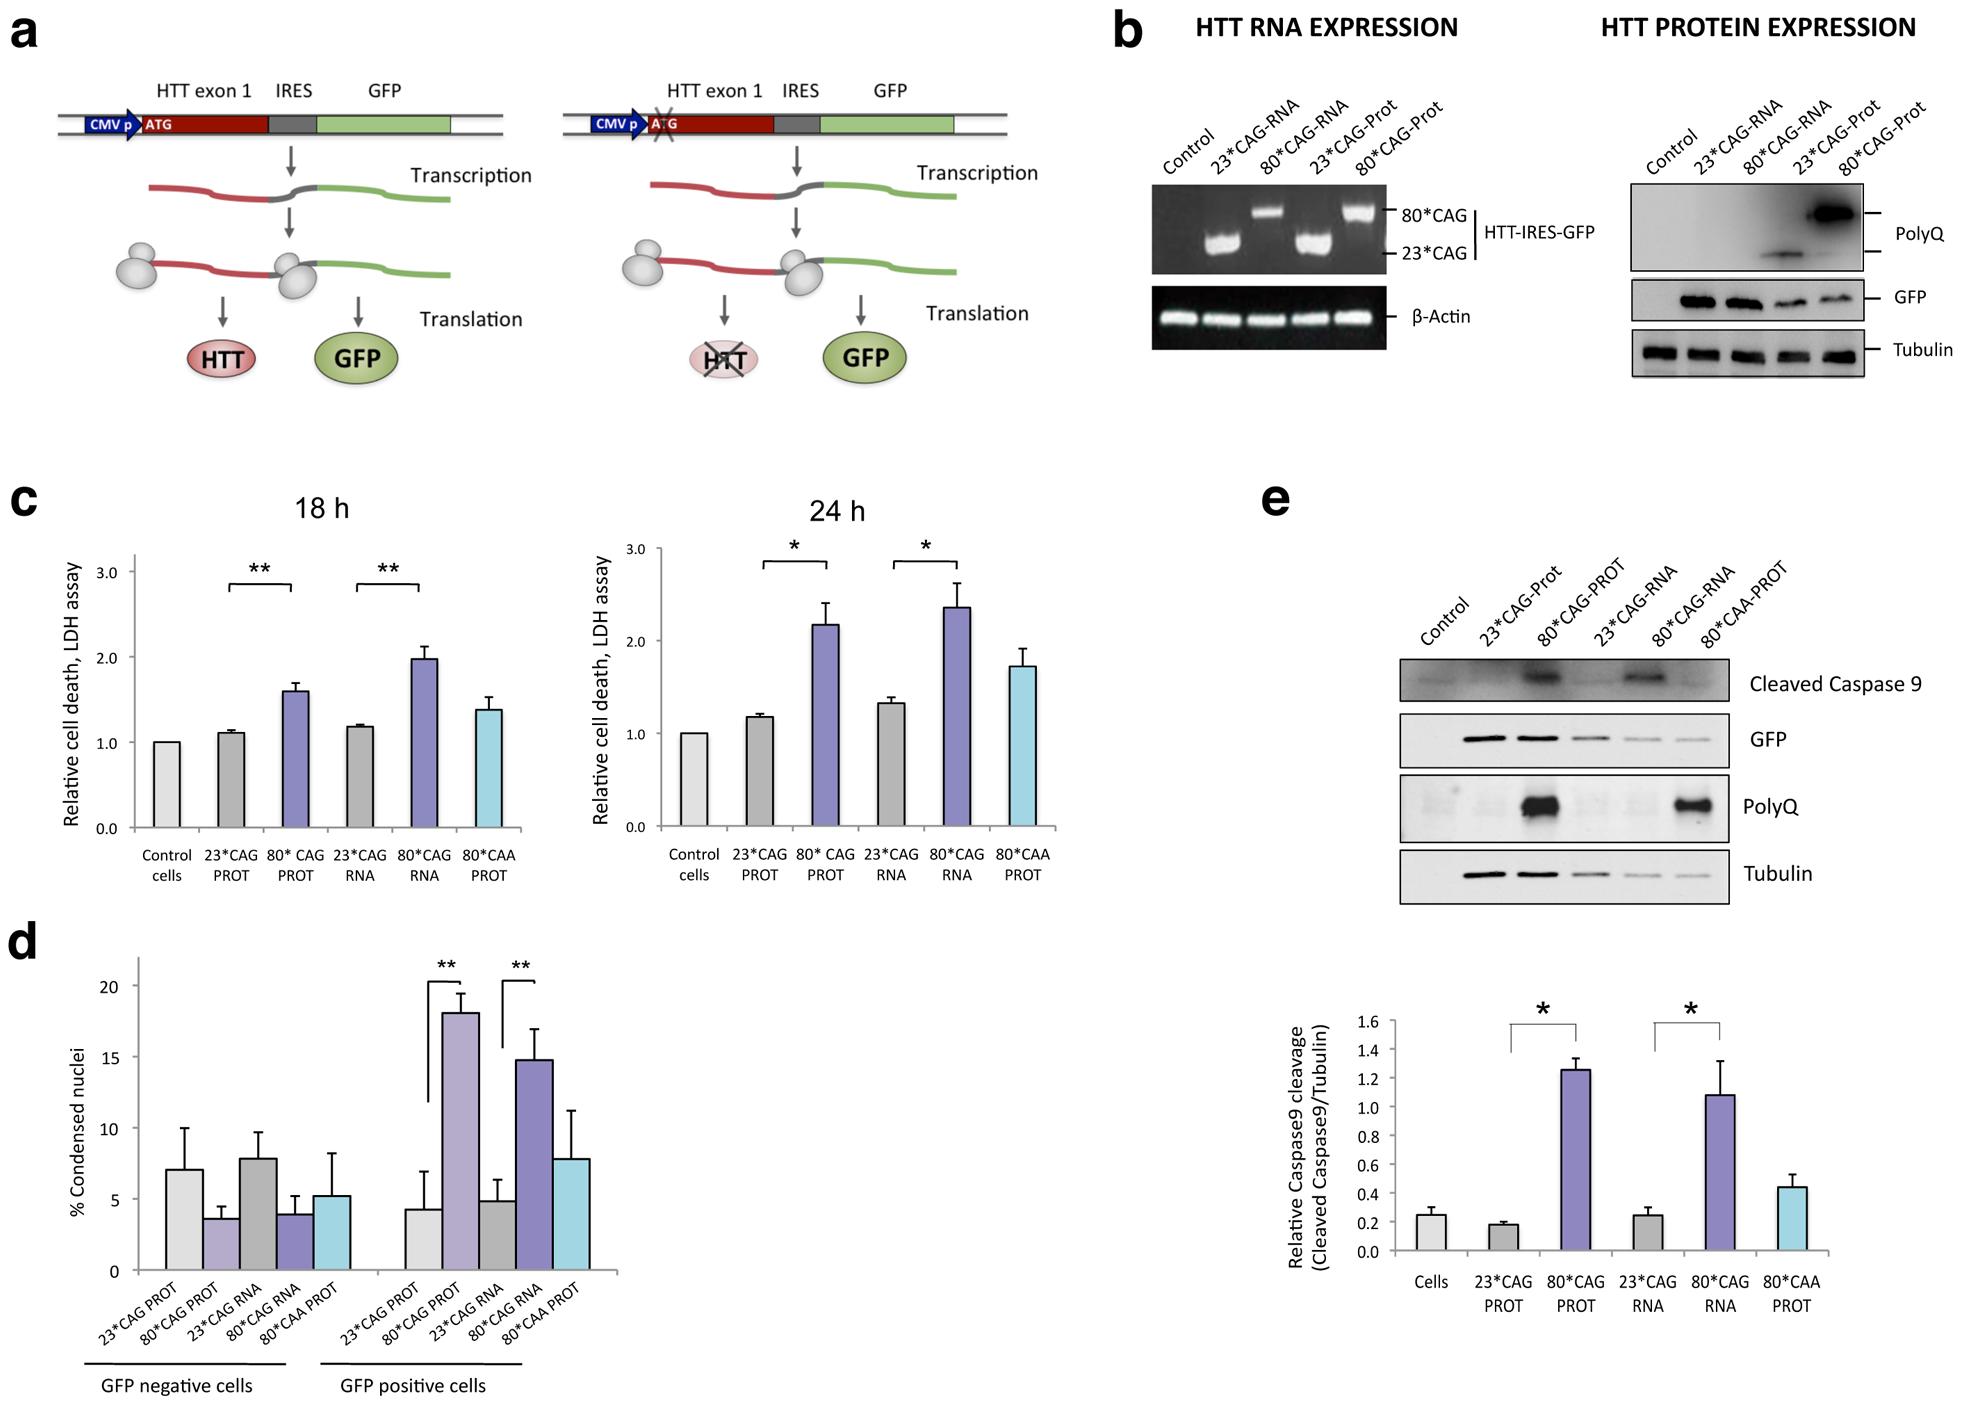 CAG-expanded exon 1 of human <i>HTT</i> is toxic at the RNA level.